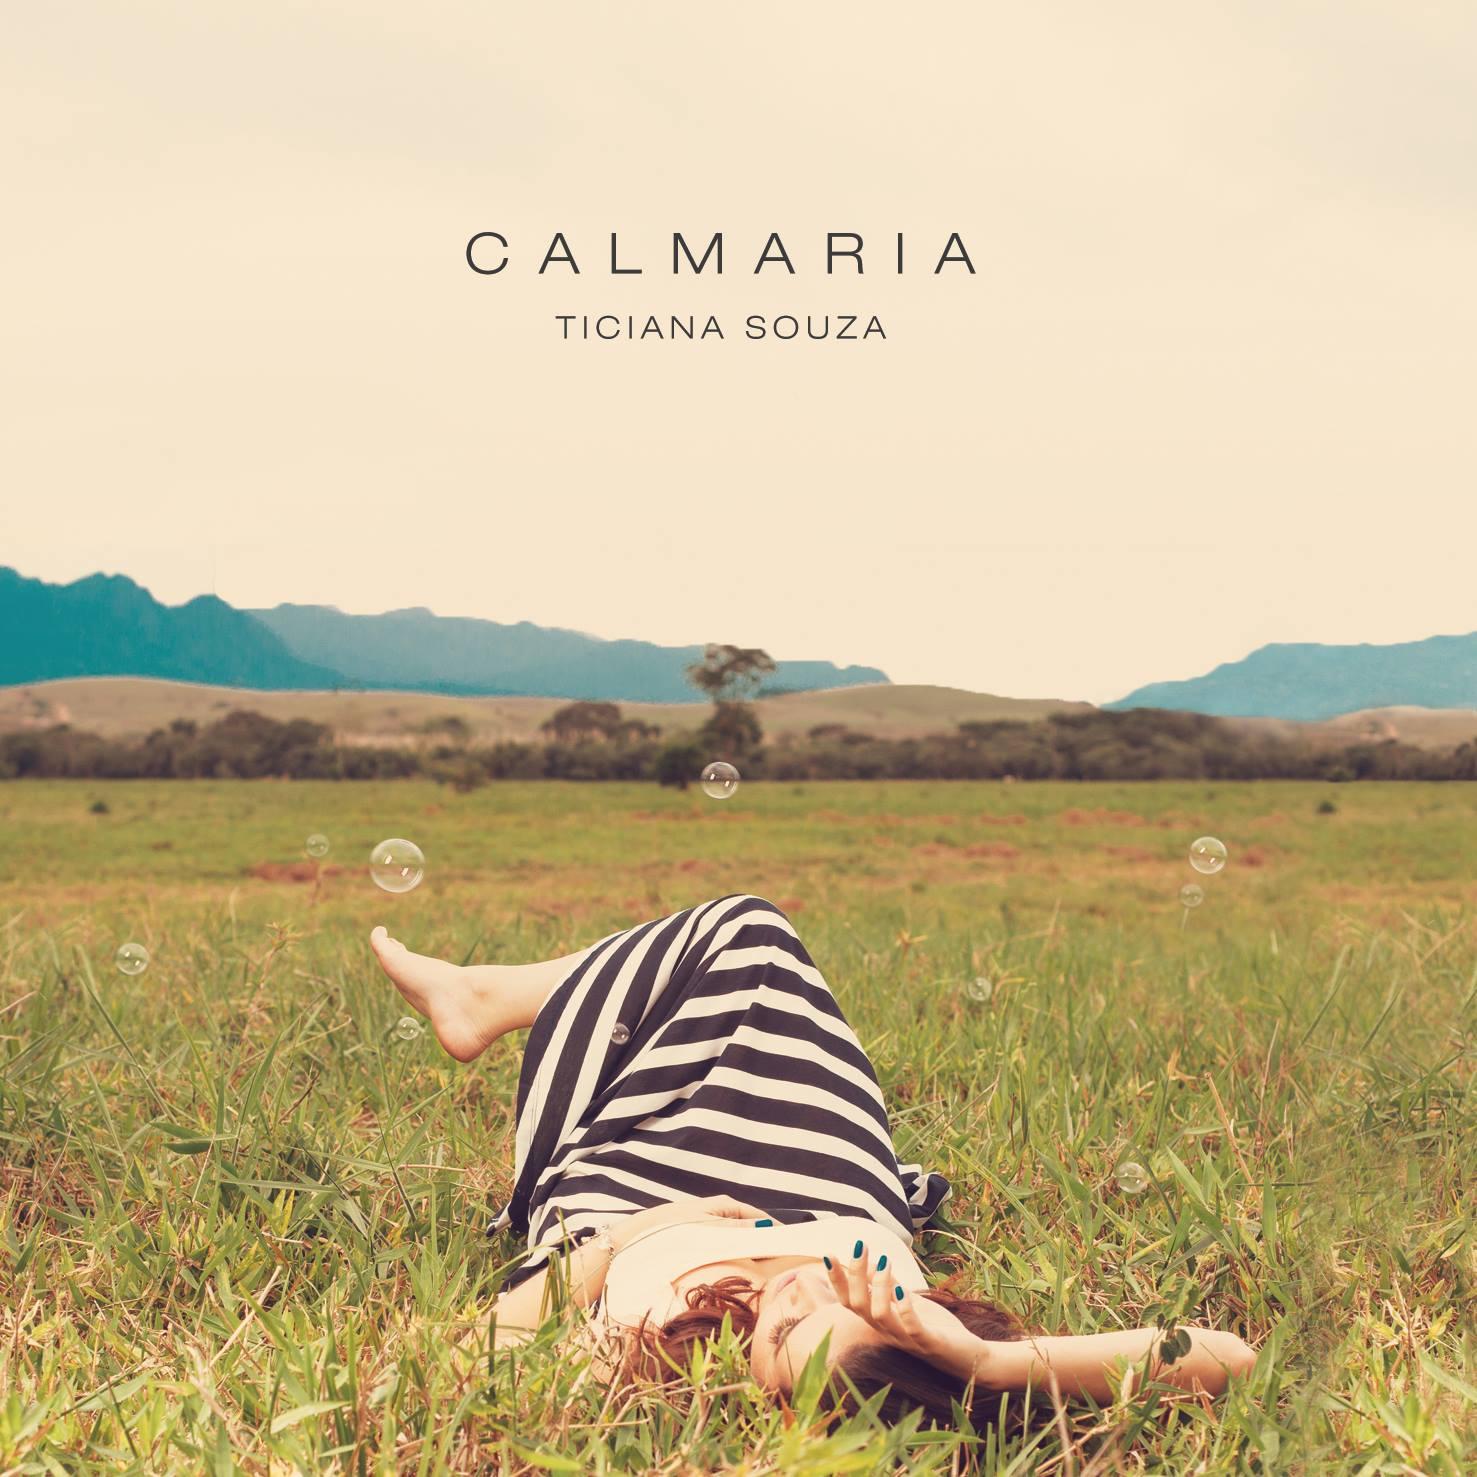 Ticiana cover album